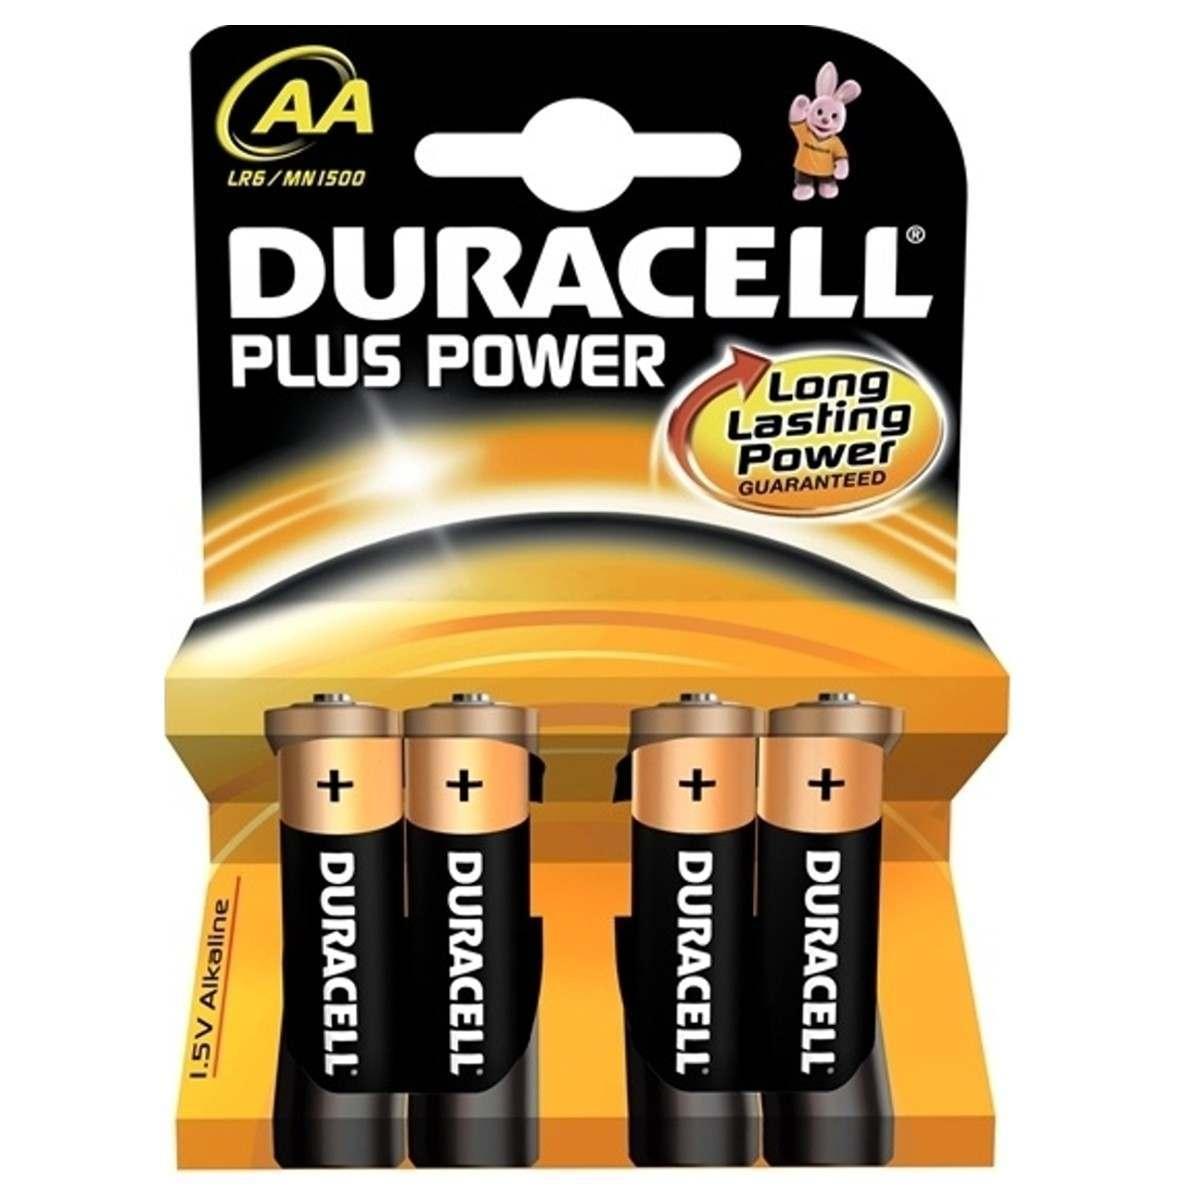 Duracell Alkaline Batteries AA Pack of 4